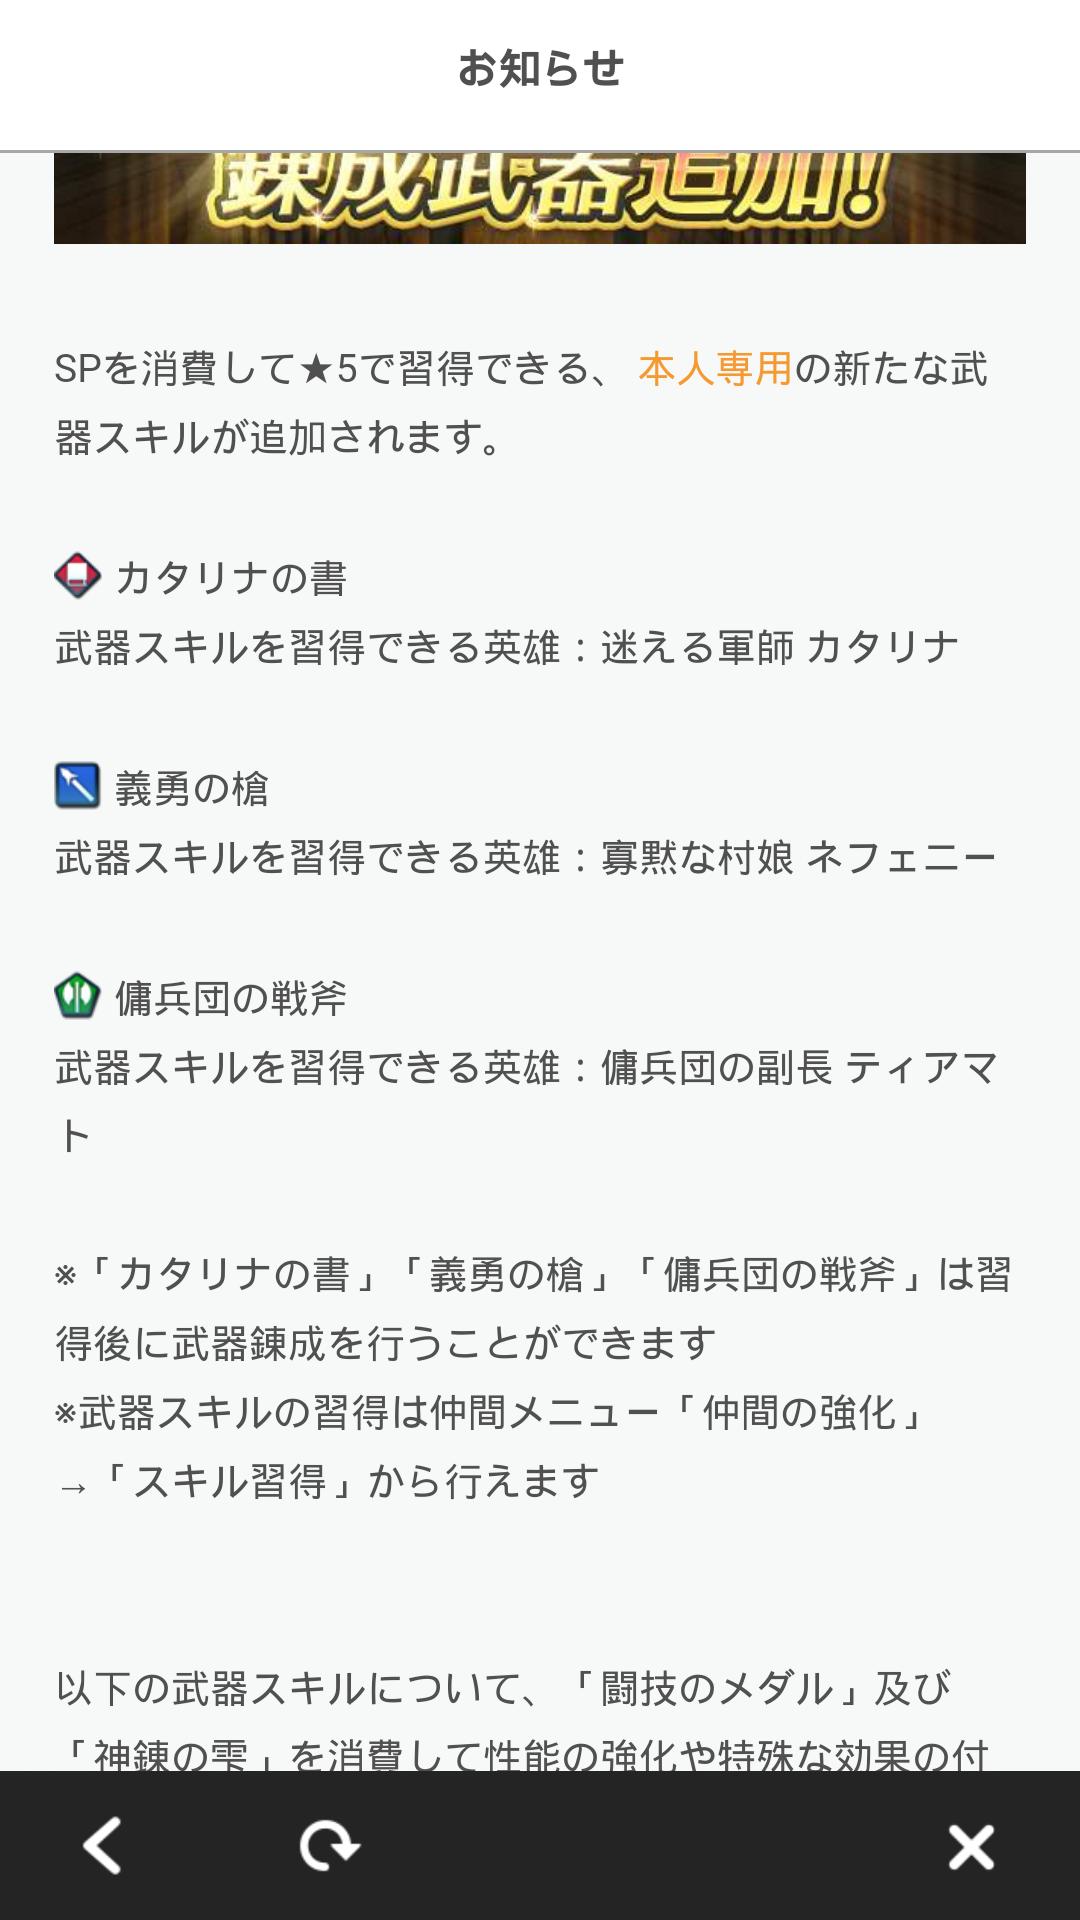 Screenshot_2018-06-30-03-50-59.png